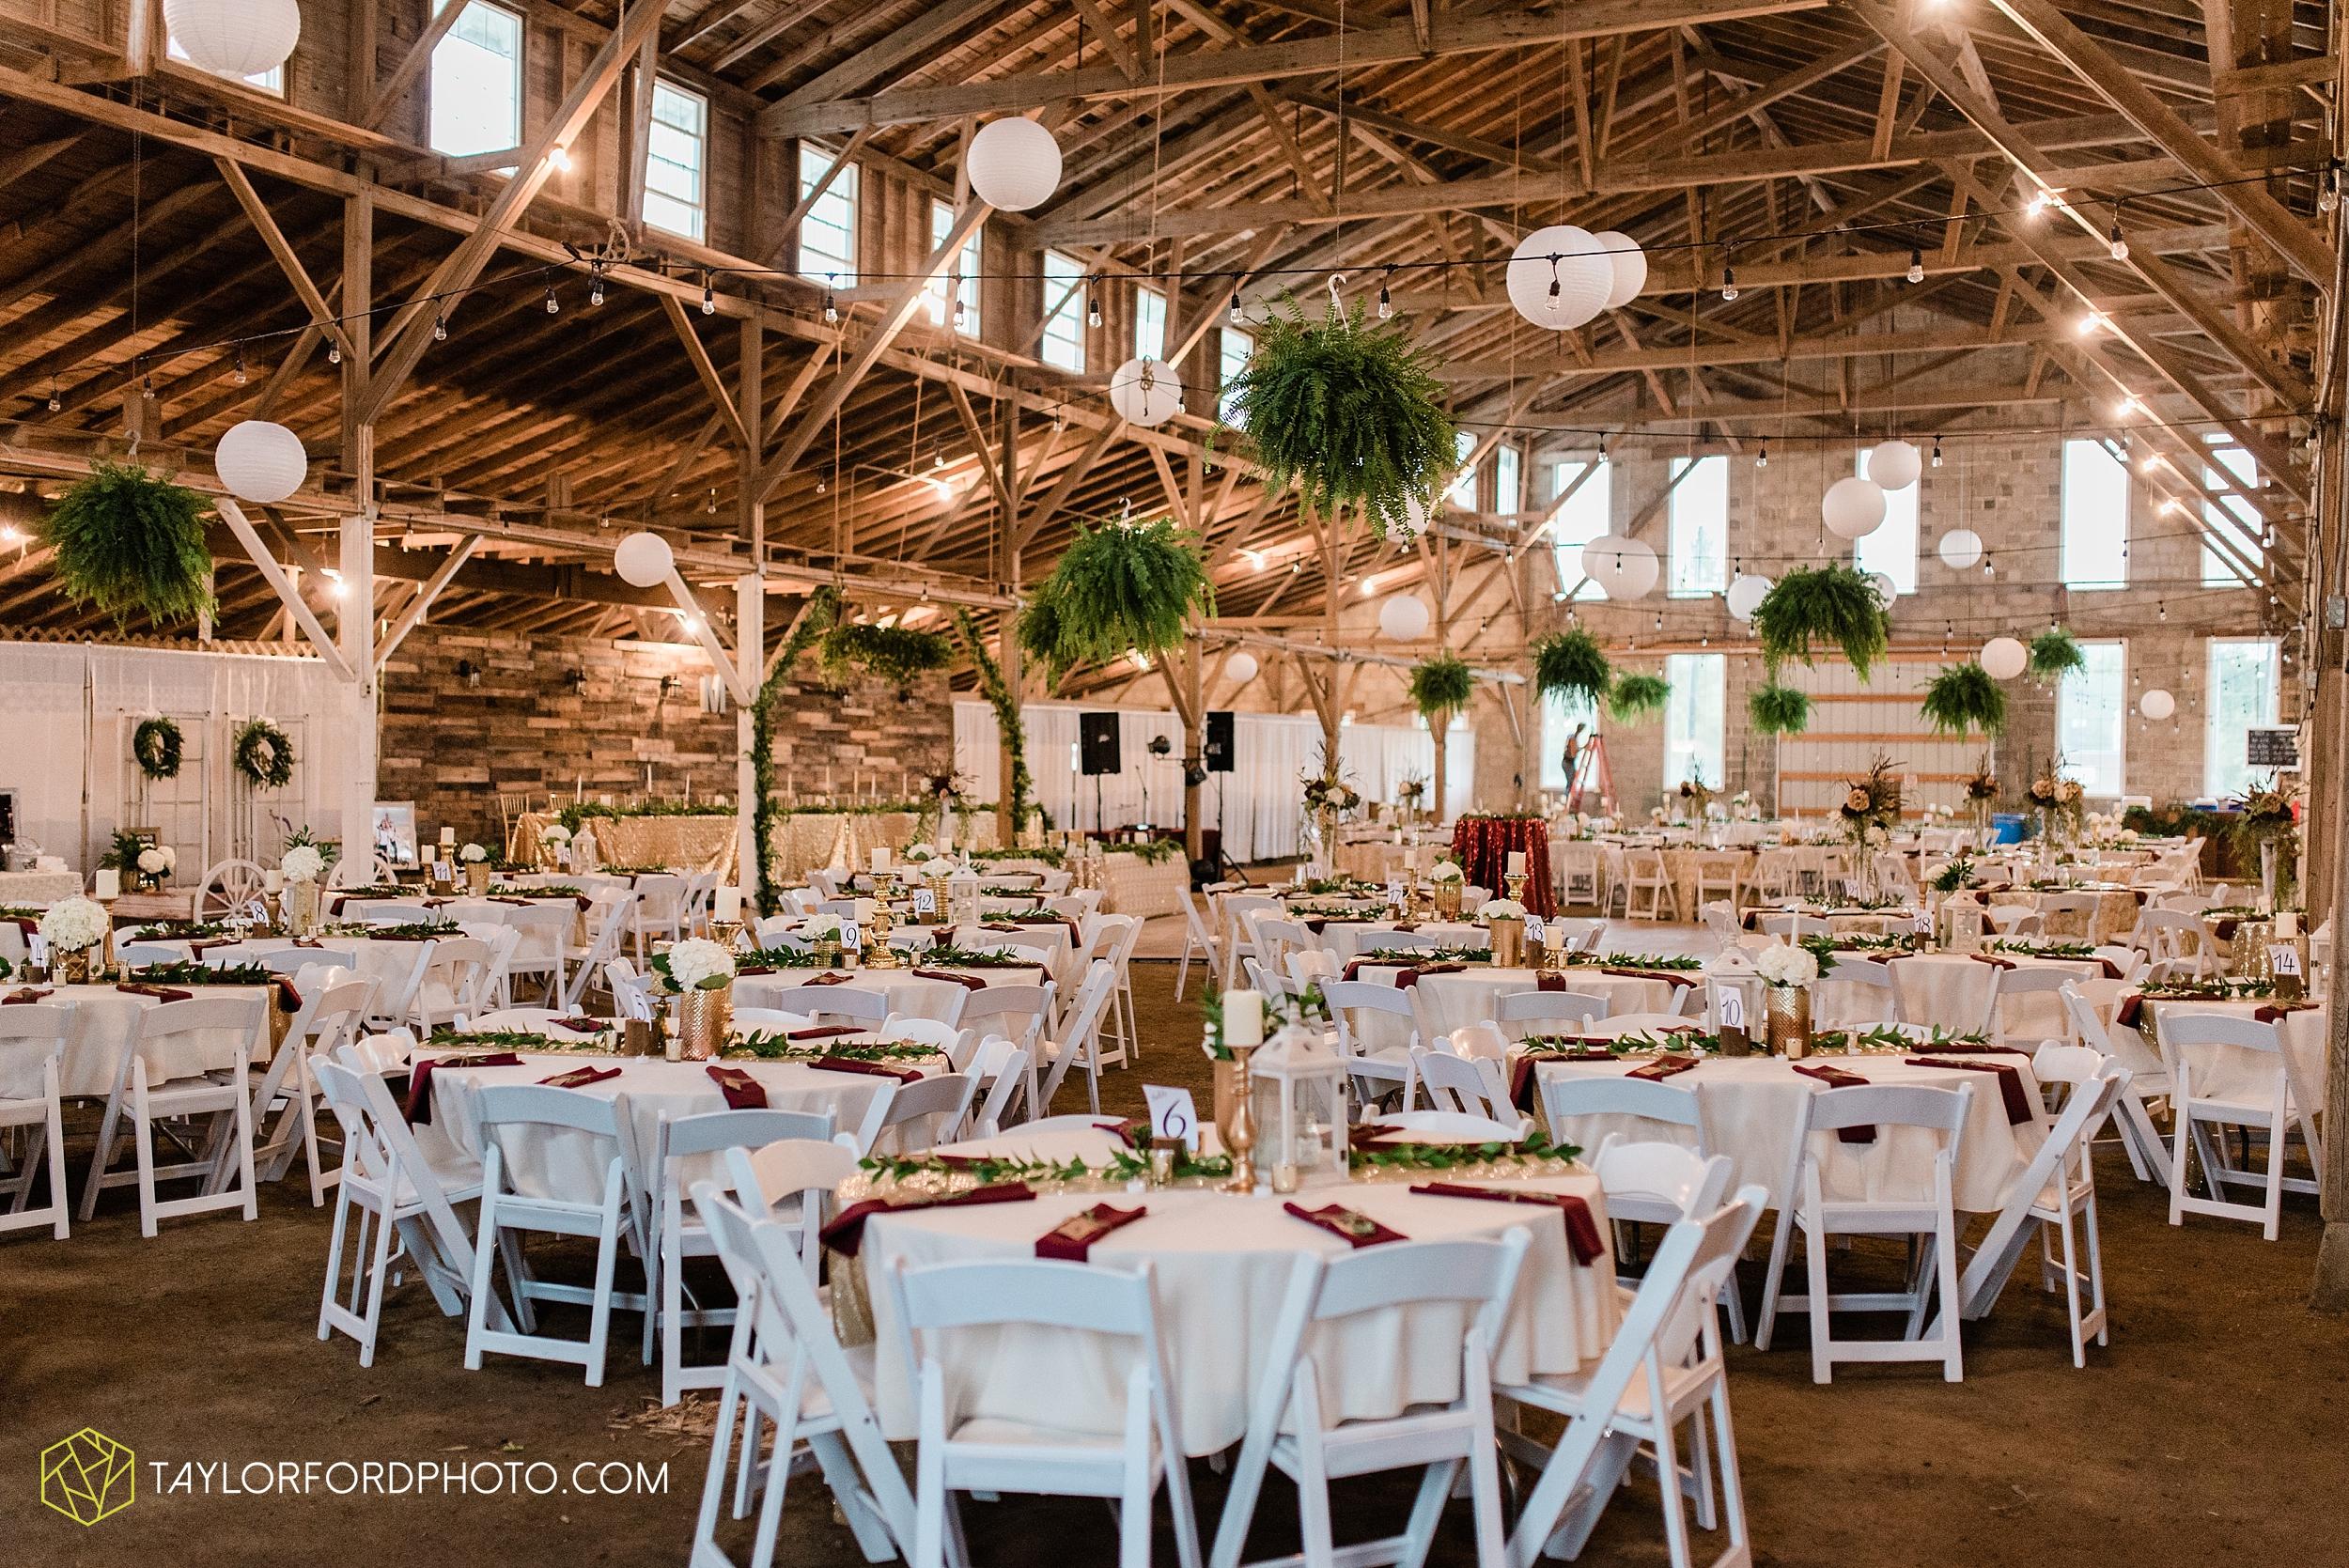 van-wert-ohio-first-united-methodist-church-county-dairy-barn-wedding-photographer-taylor-ford-photography_9867.jpg